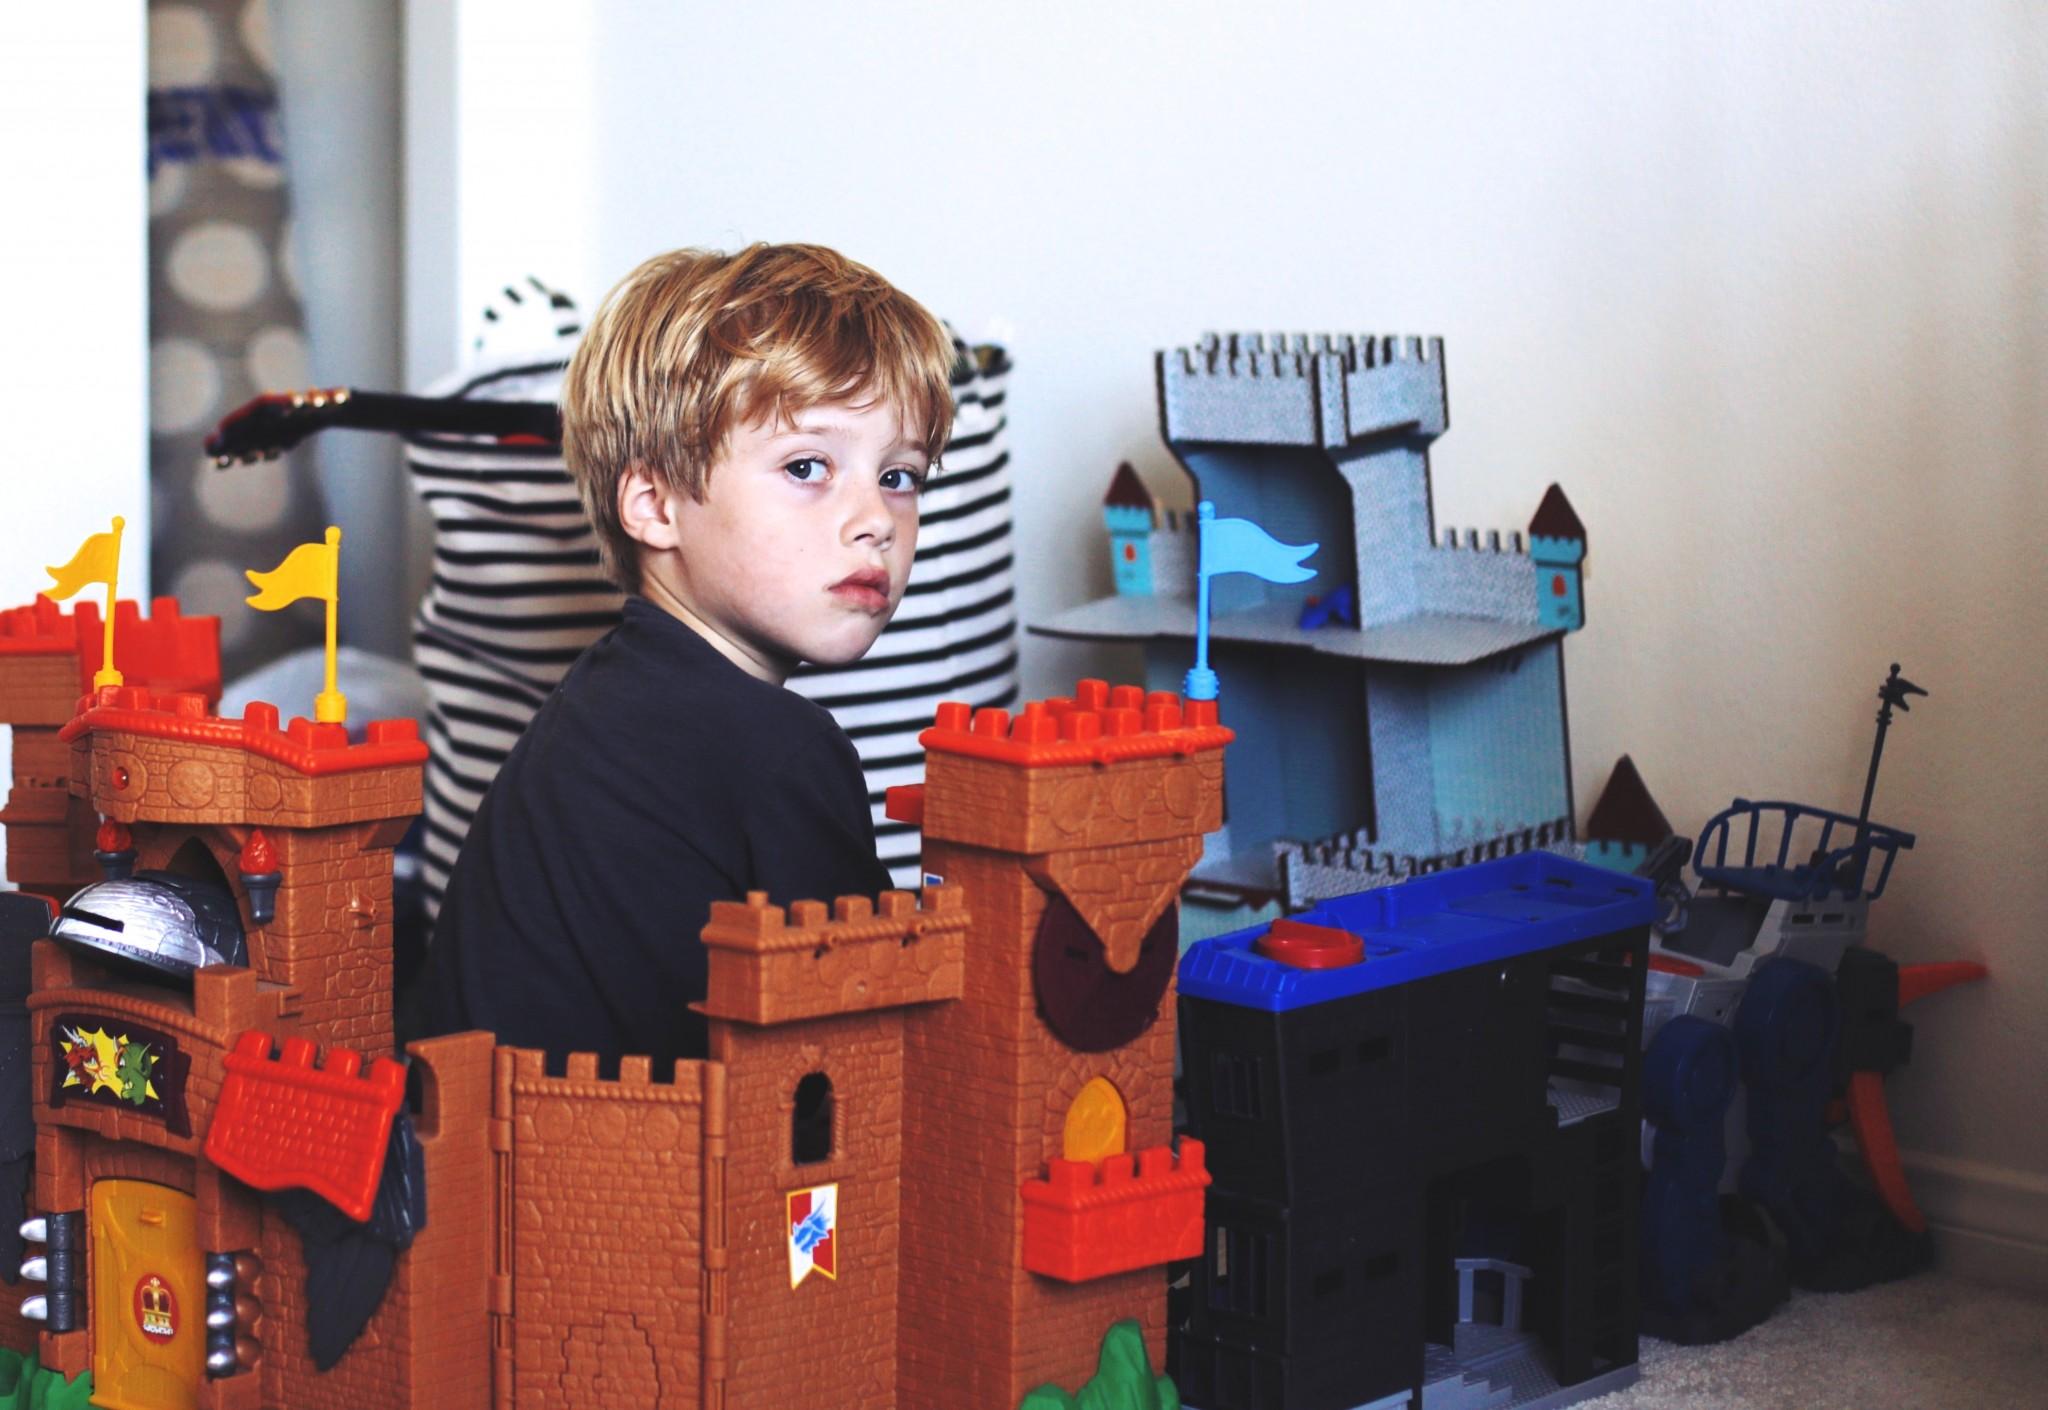 41/52 Madelon. 52 project. Each kid. One photo. Every week